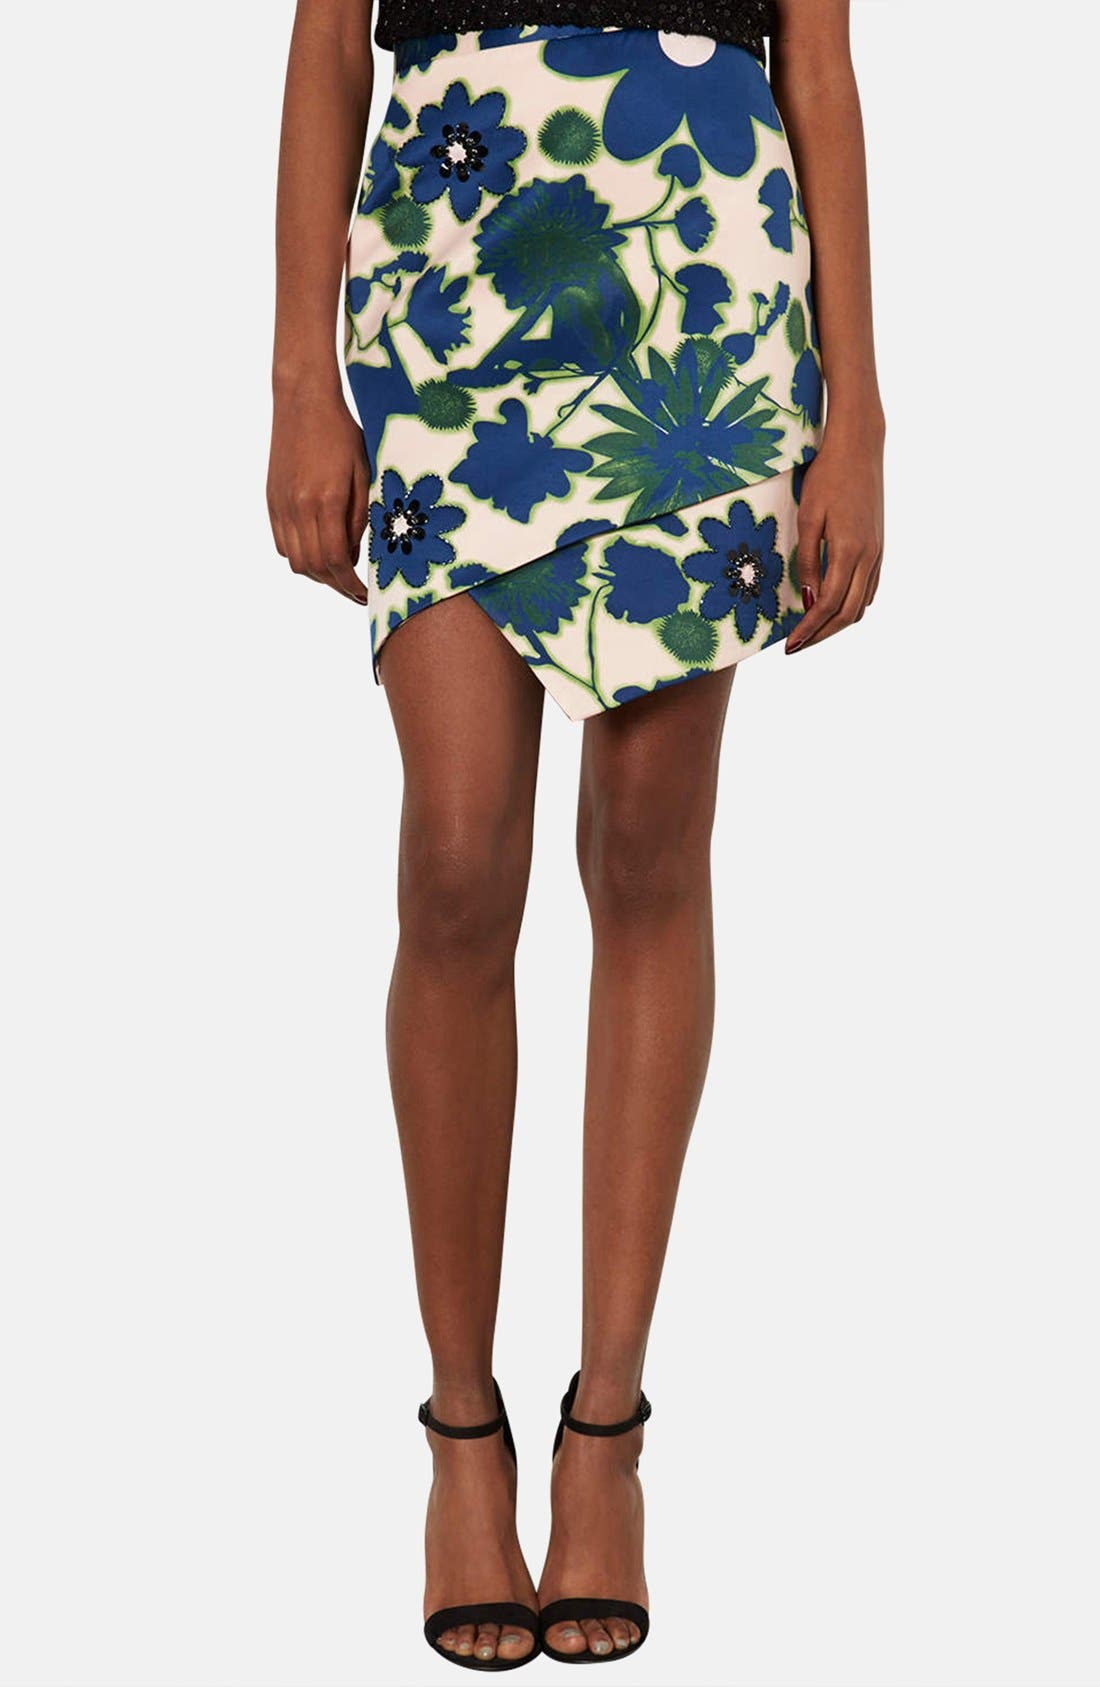 Alternate Image 1 Selected - Topshop 'Floral X-Ray' Embellished Print Skirt